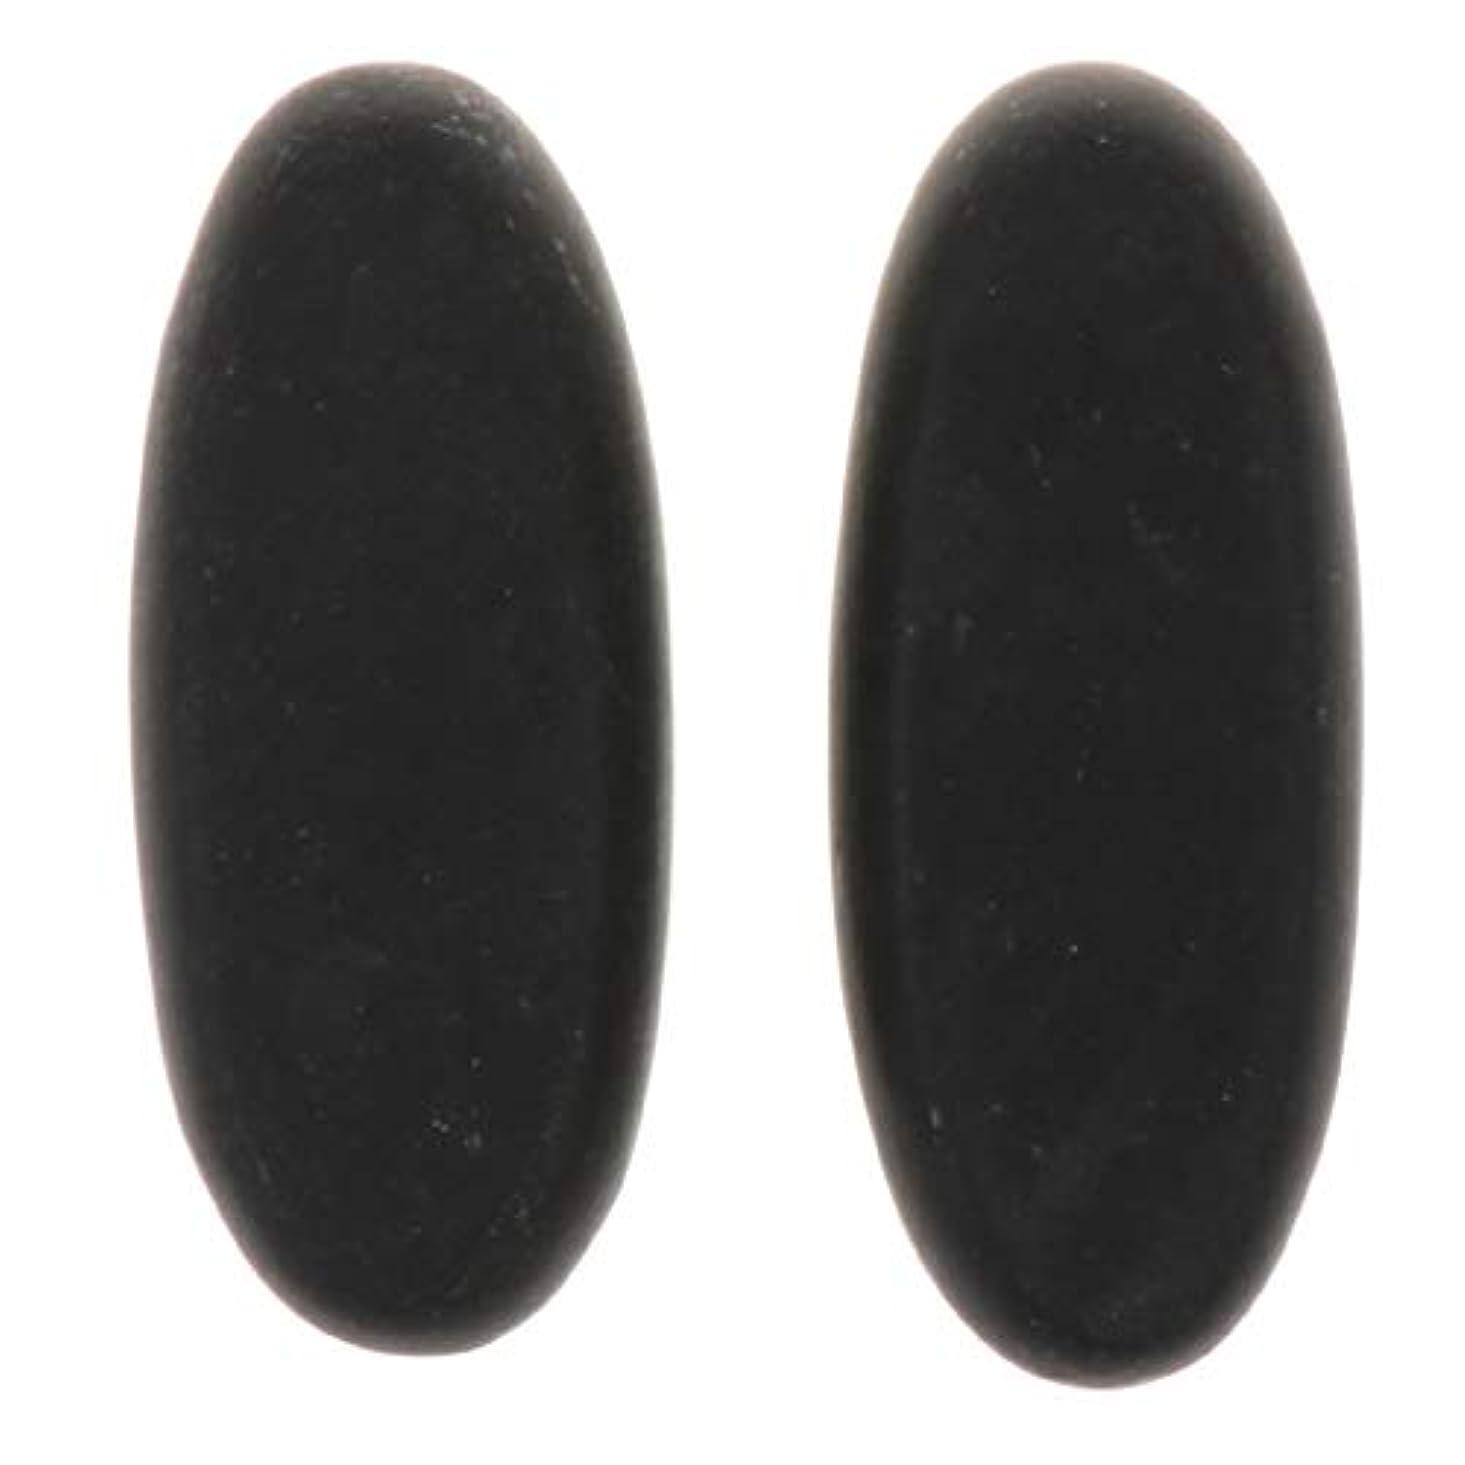 P Prettyia マッサージストーン マッサージ石 天然石ホットストーン マッサージ用玄武岩 ツボ押し SPA 2個 全2サイズ - 8×3.2×1.5cm